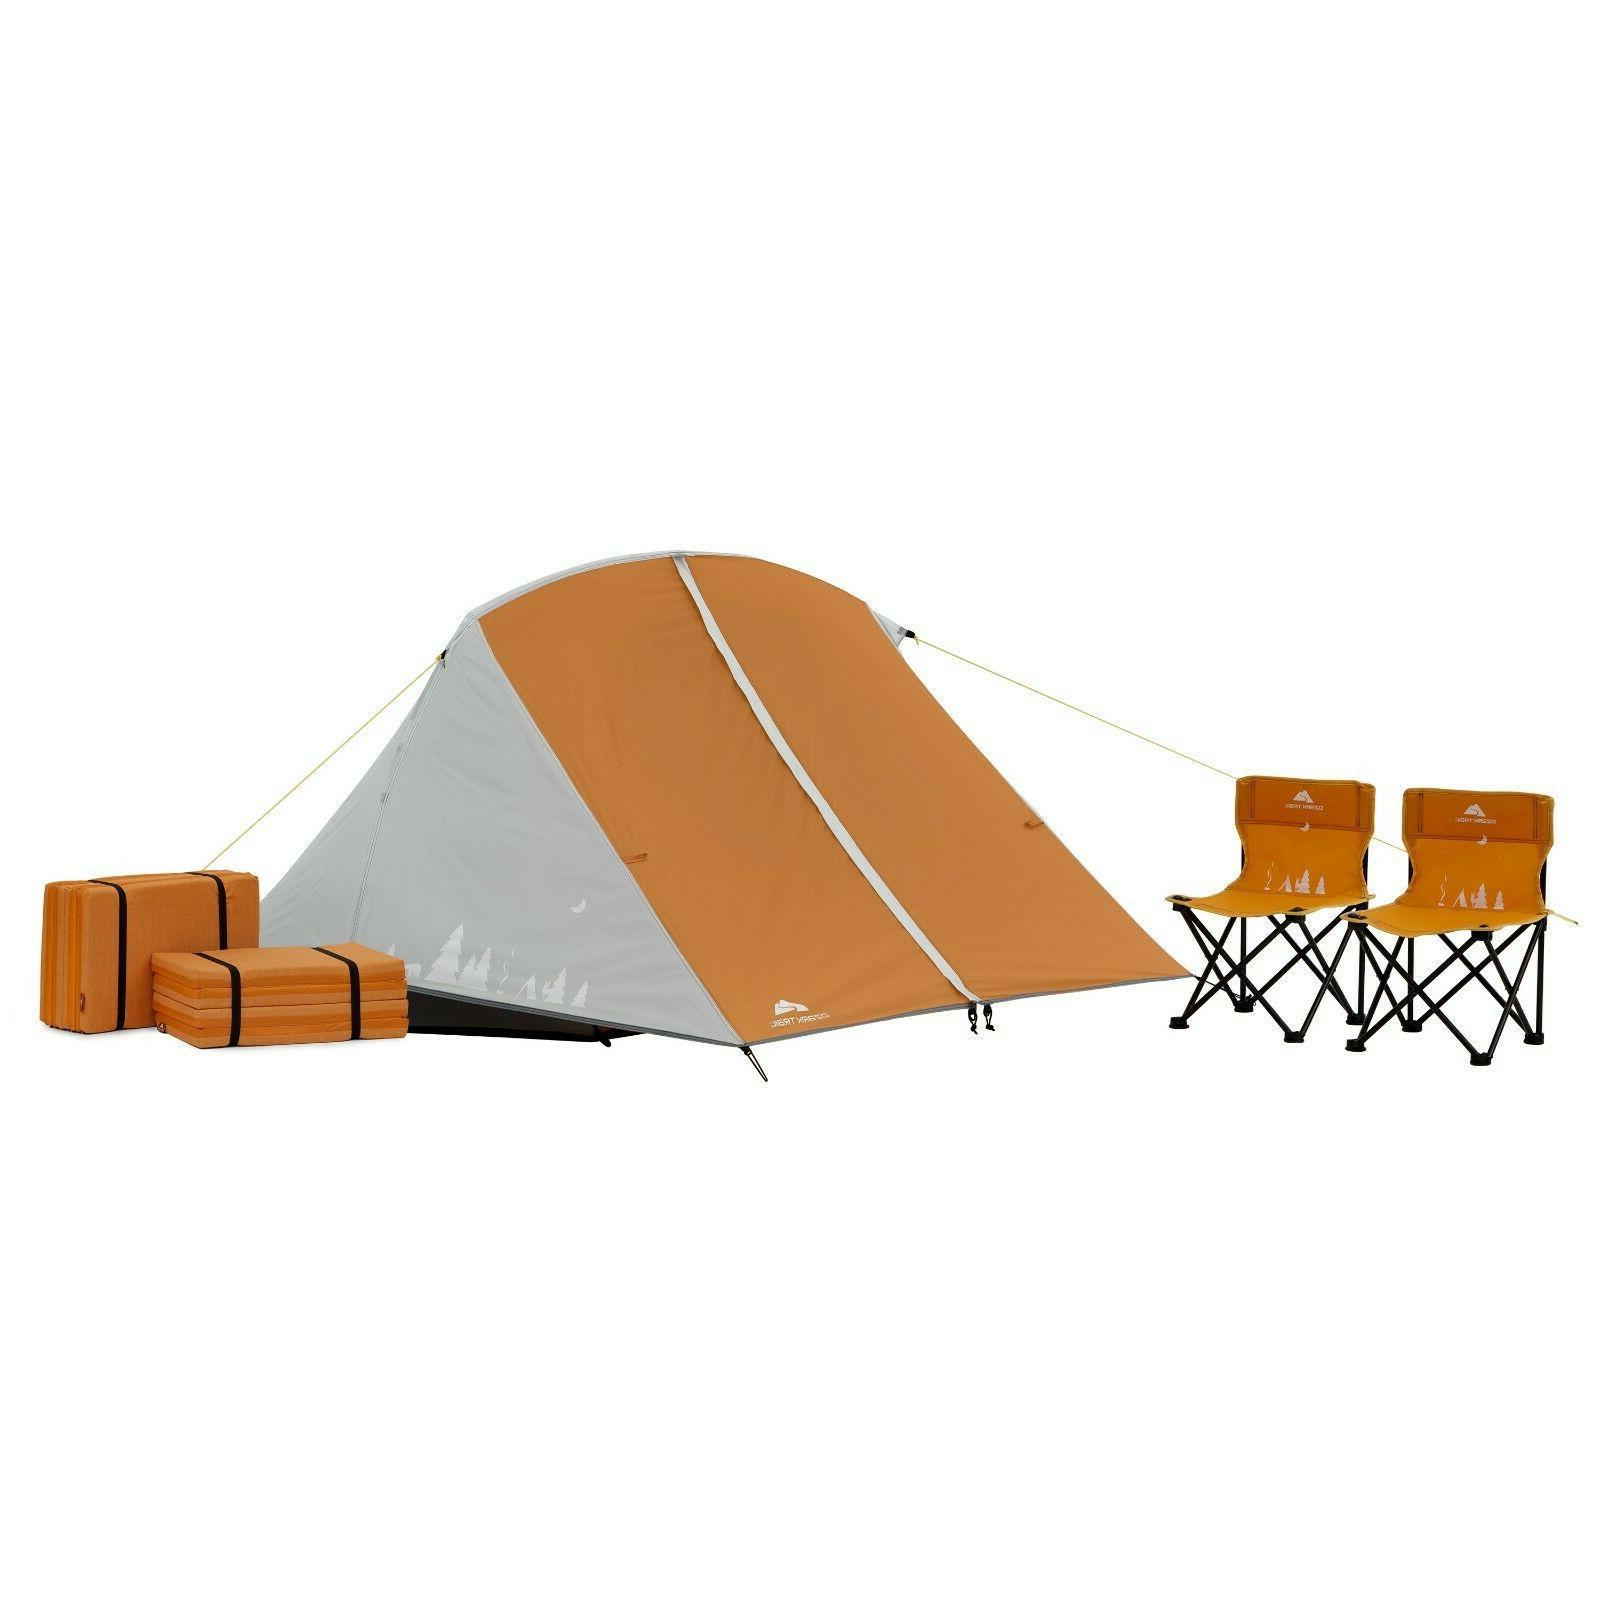 3 person kids tent camping bundle